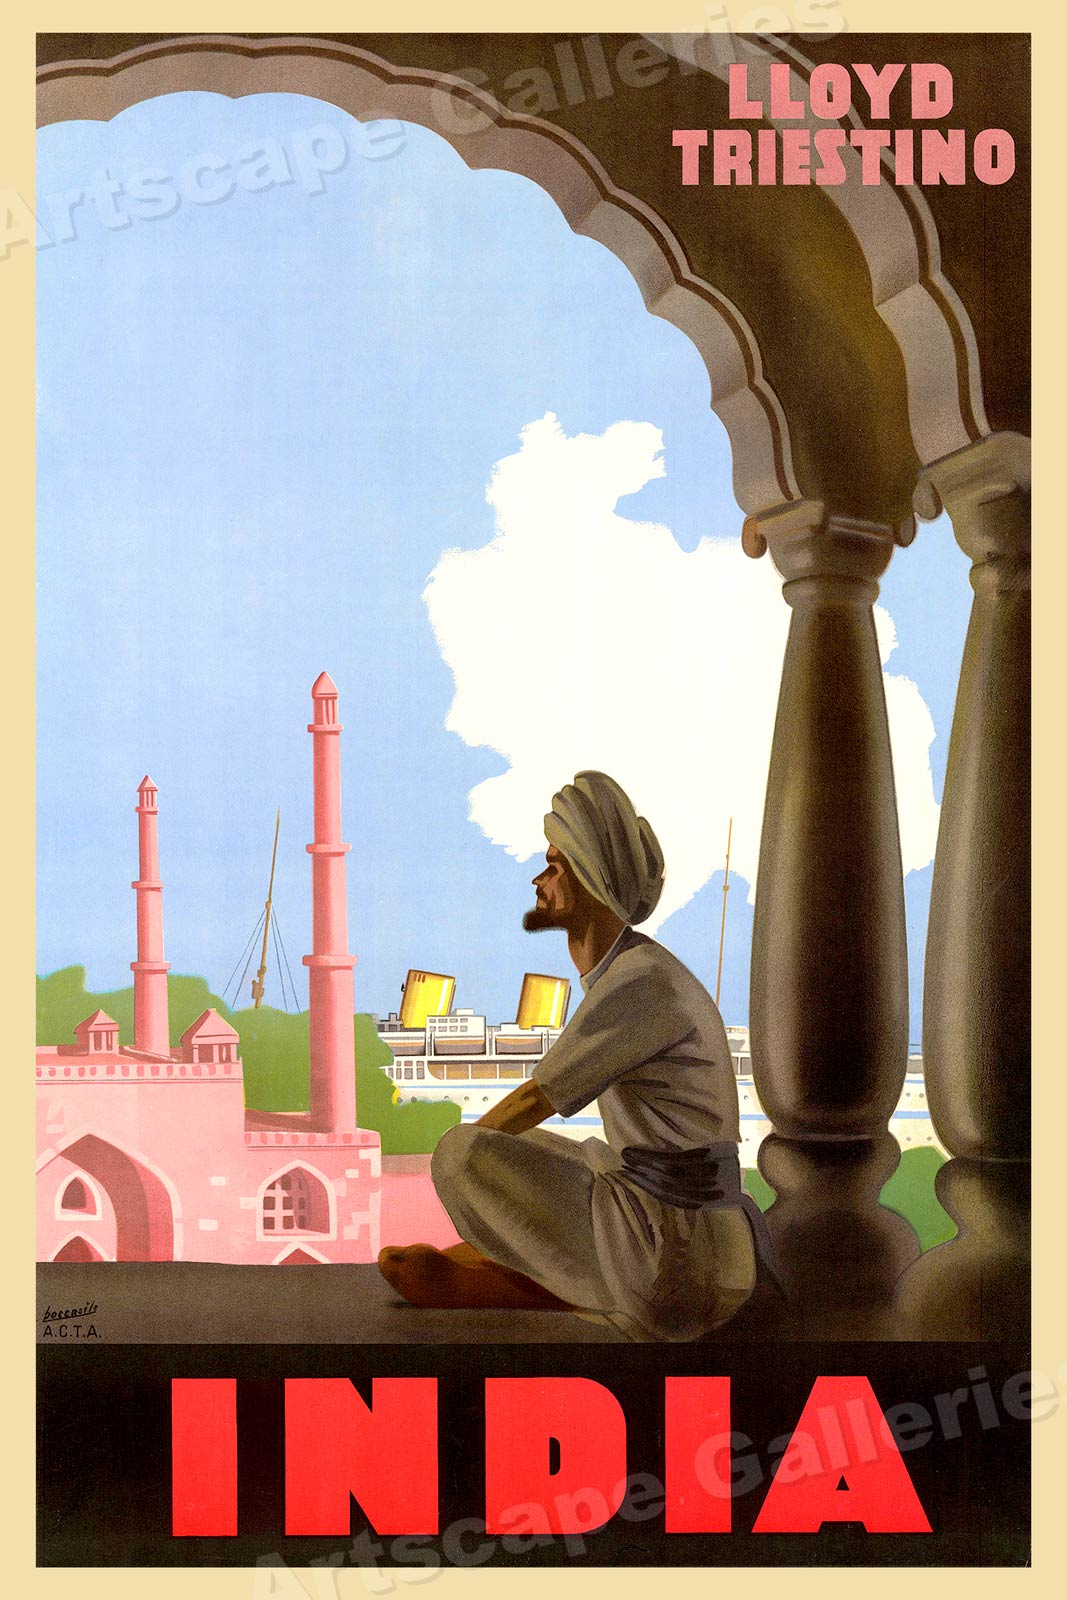 "India /""Lloyd Triestino/"" 1949 Vintage Style Travel Poster 24x36"